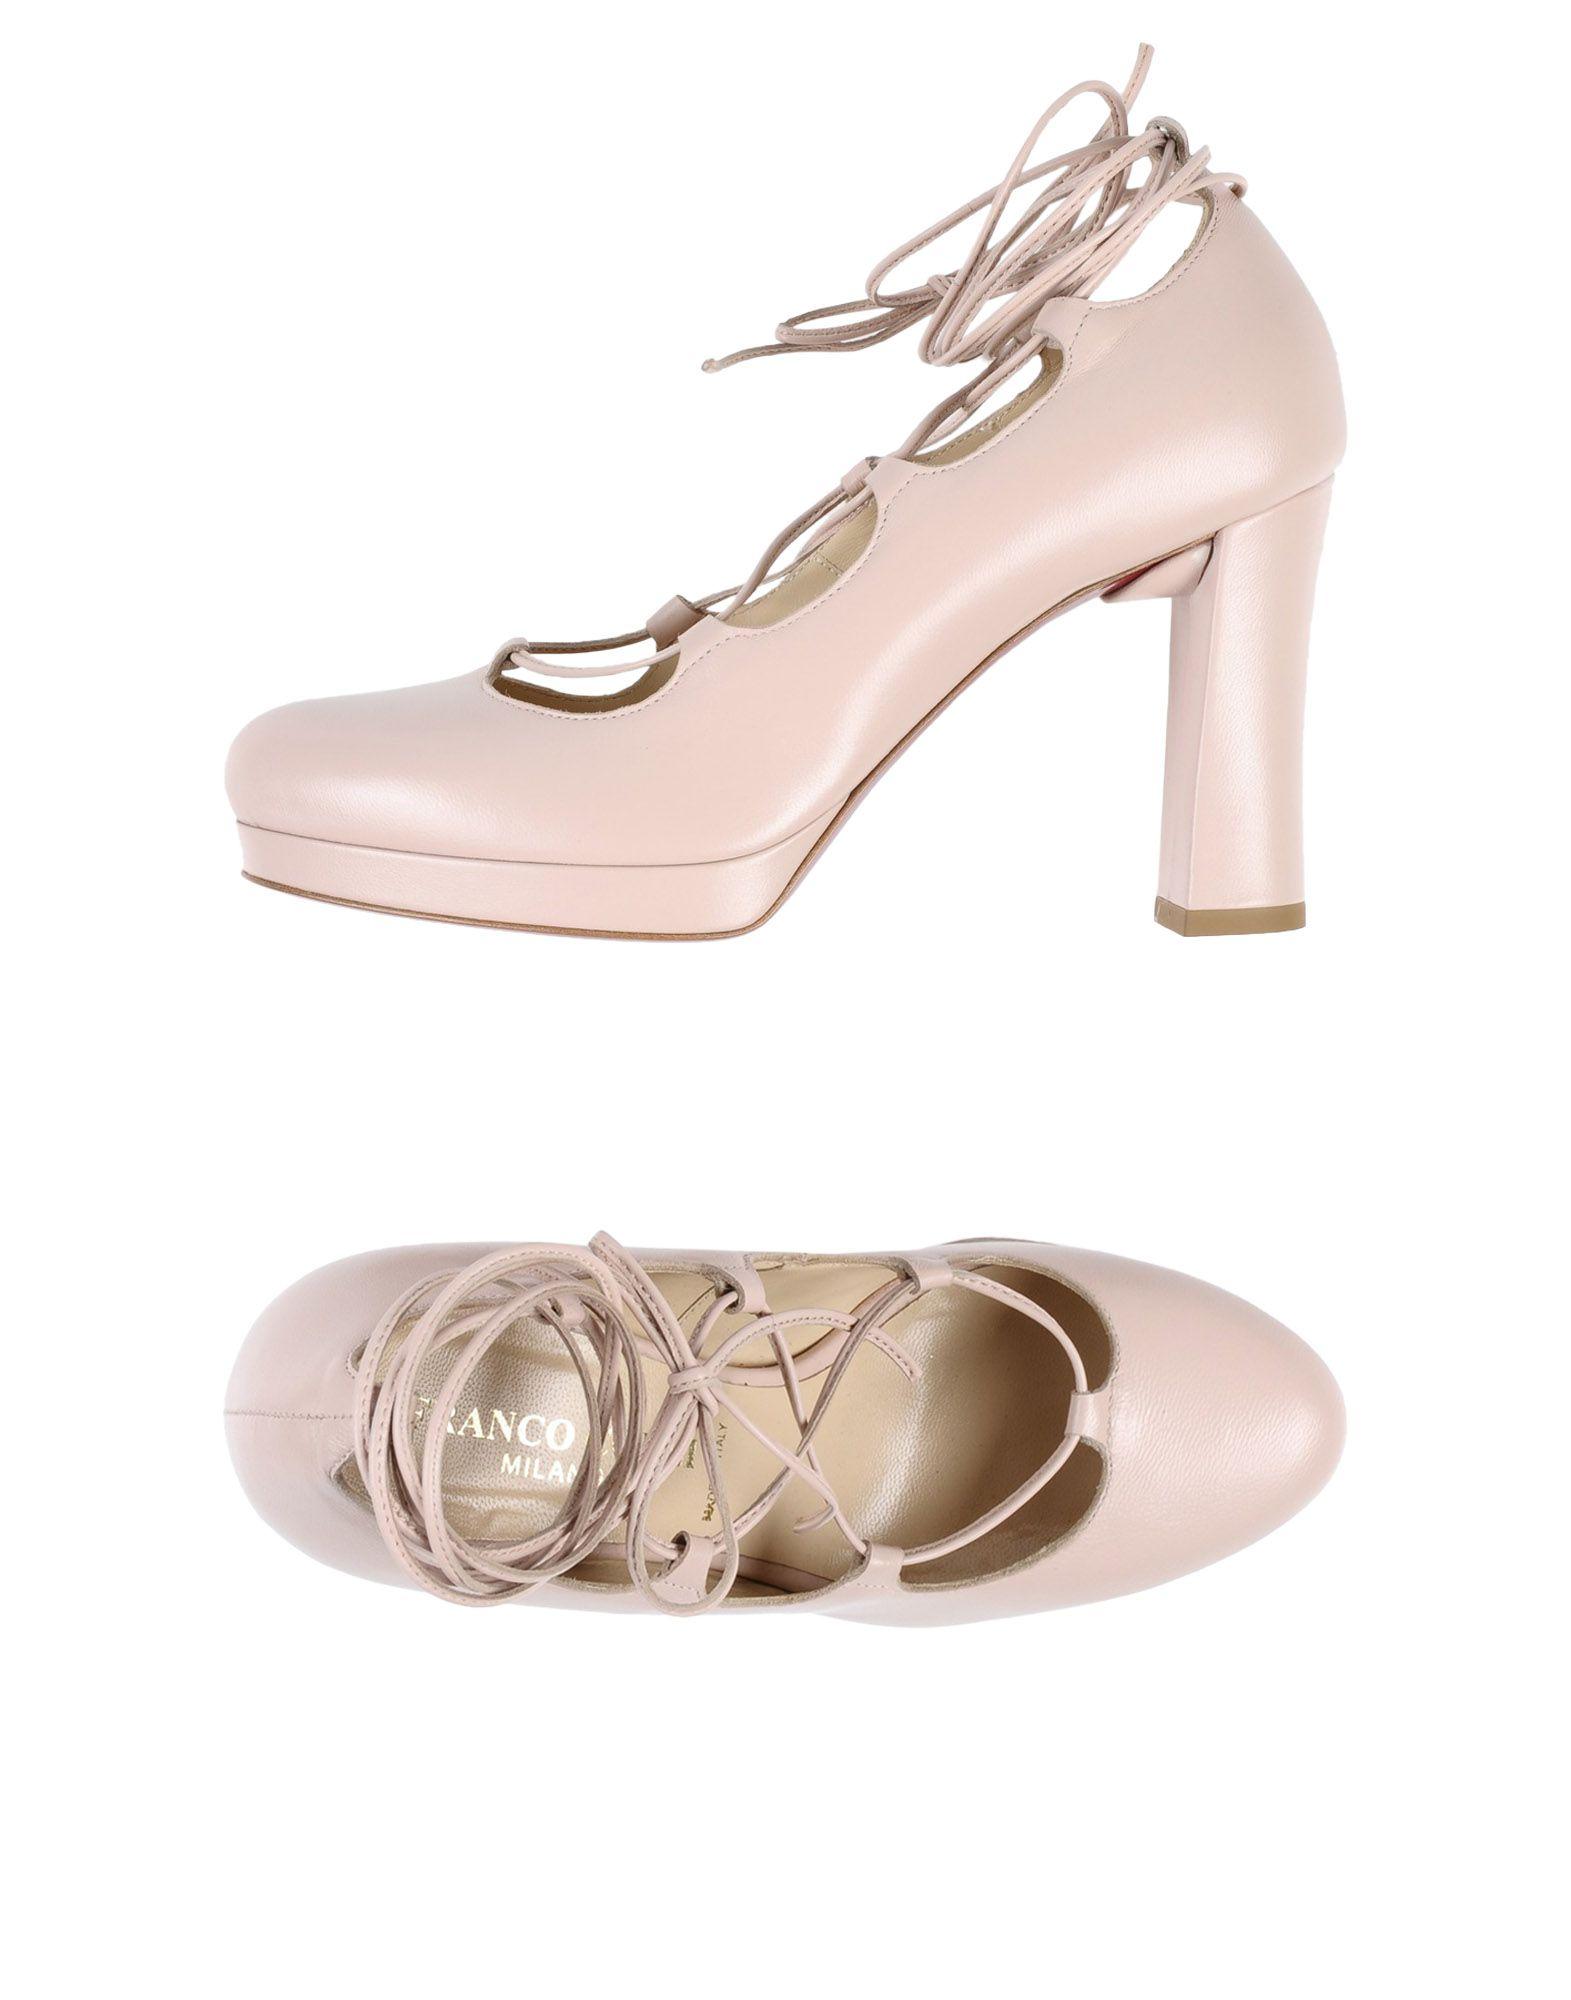 Franco Colli Pumps Damen  11408945HB Gute Qualität beliebte Schuhe